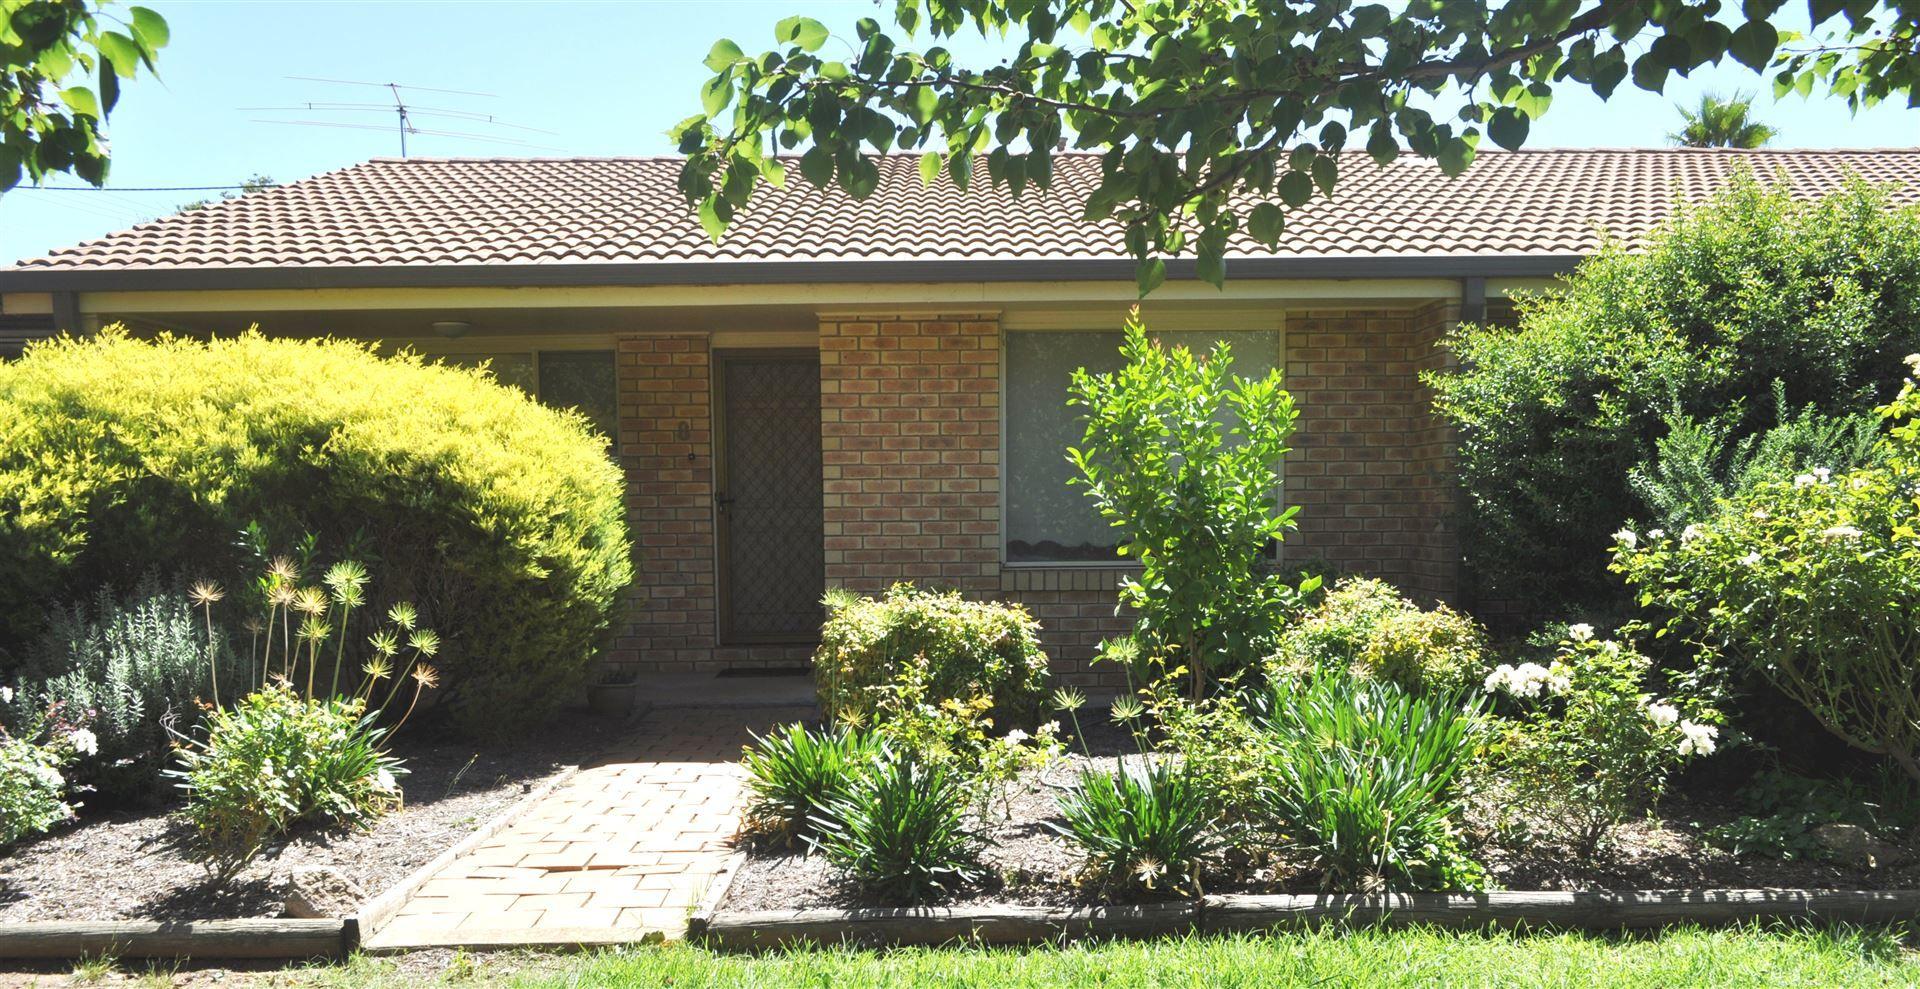 8/97 Sutton Street, Cootamundra NSW 2590, Image 0